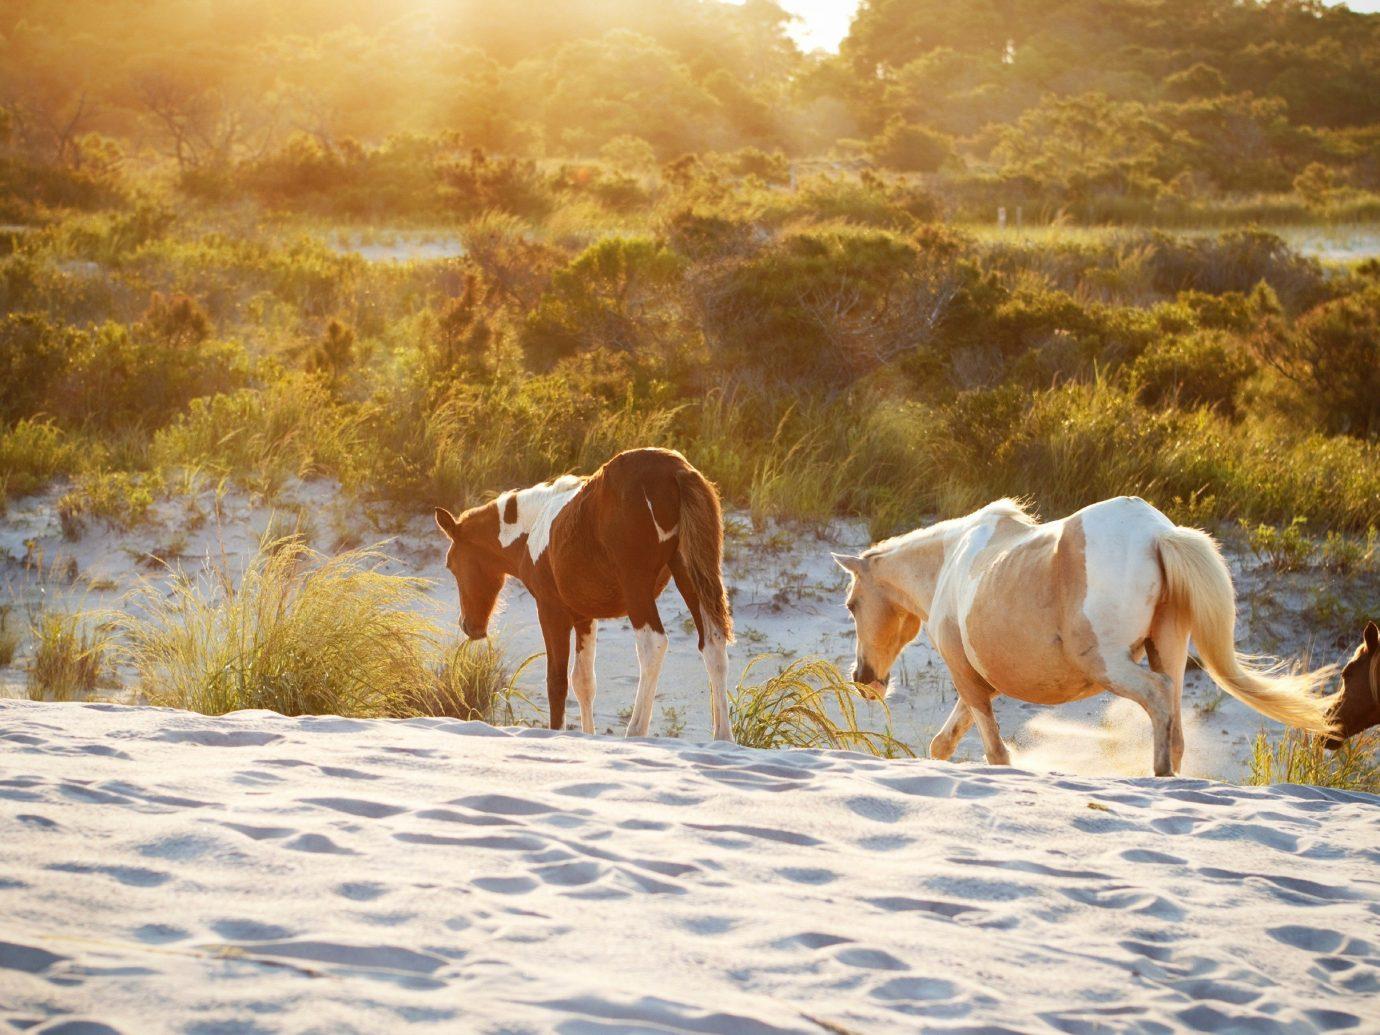 Trip Ideas outdoor horse habitat pasture herd natural environment grassland mustang horse mammal grazing season morning steppe landscape mare meadow horse like mammal bovine cattle like mammal